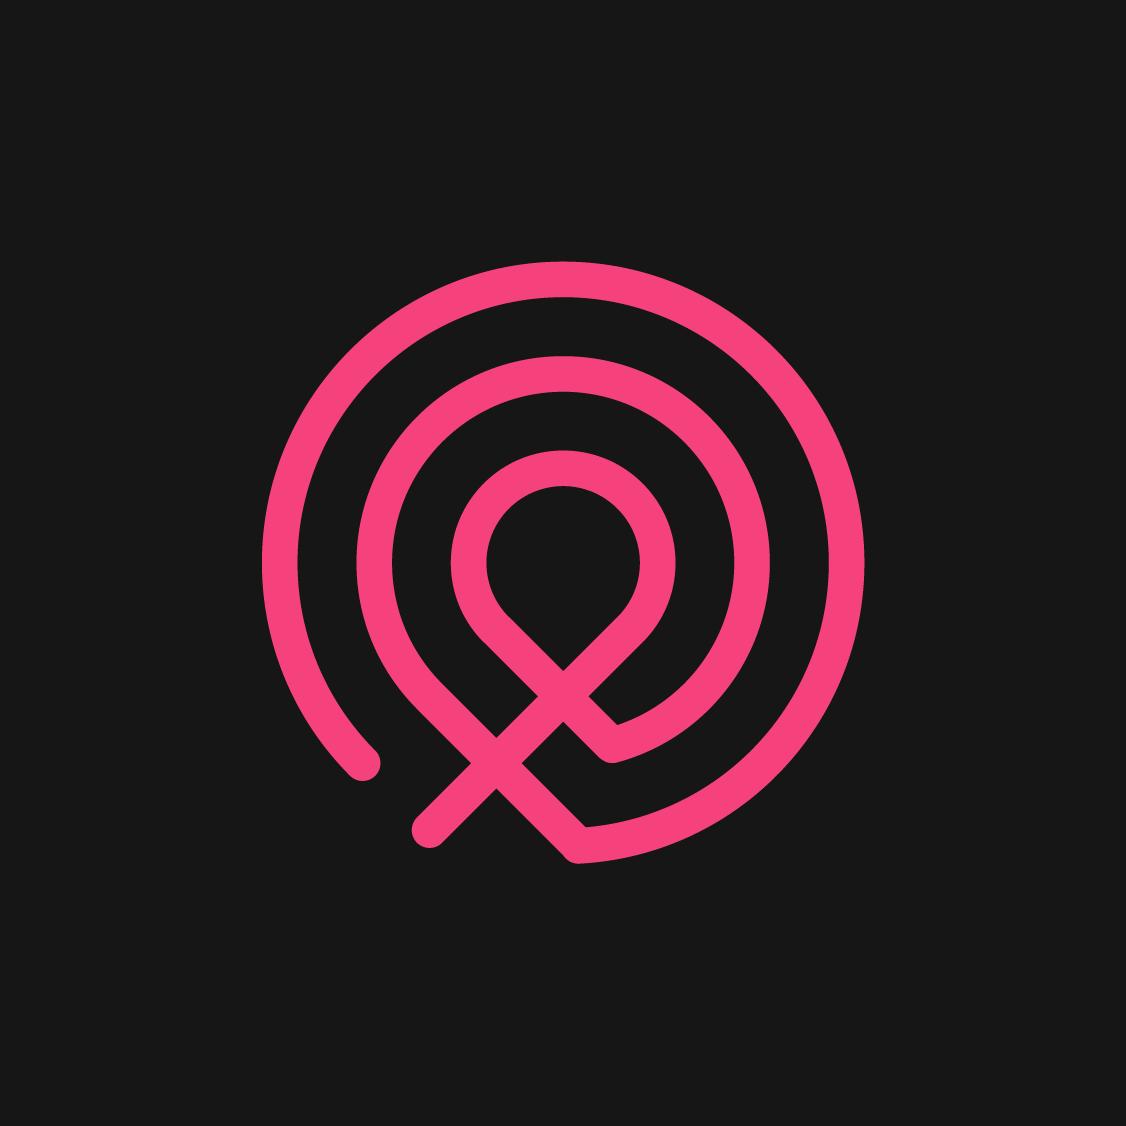 all-logos-2020-63